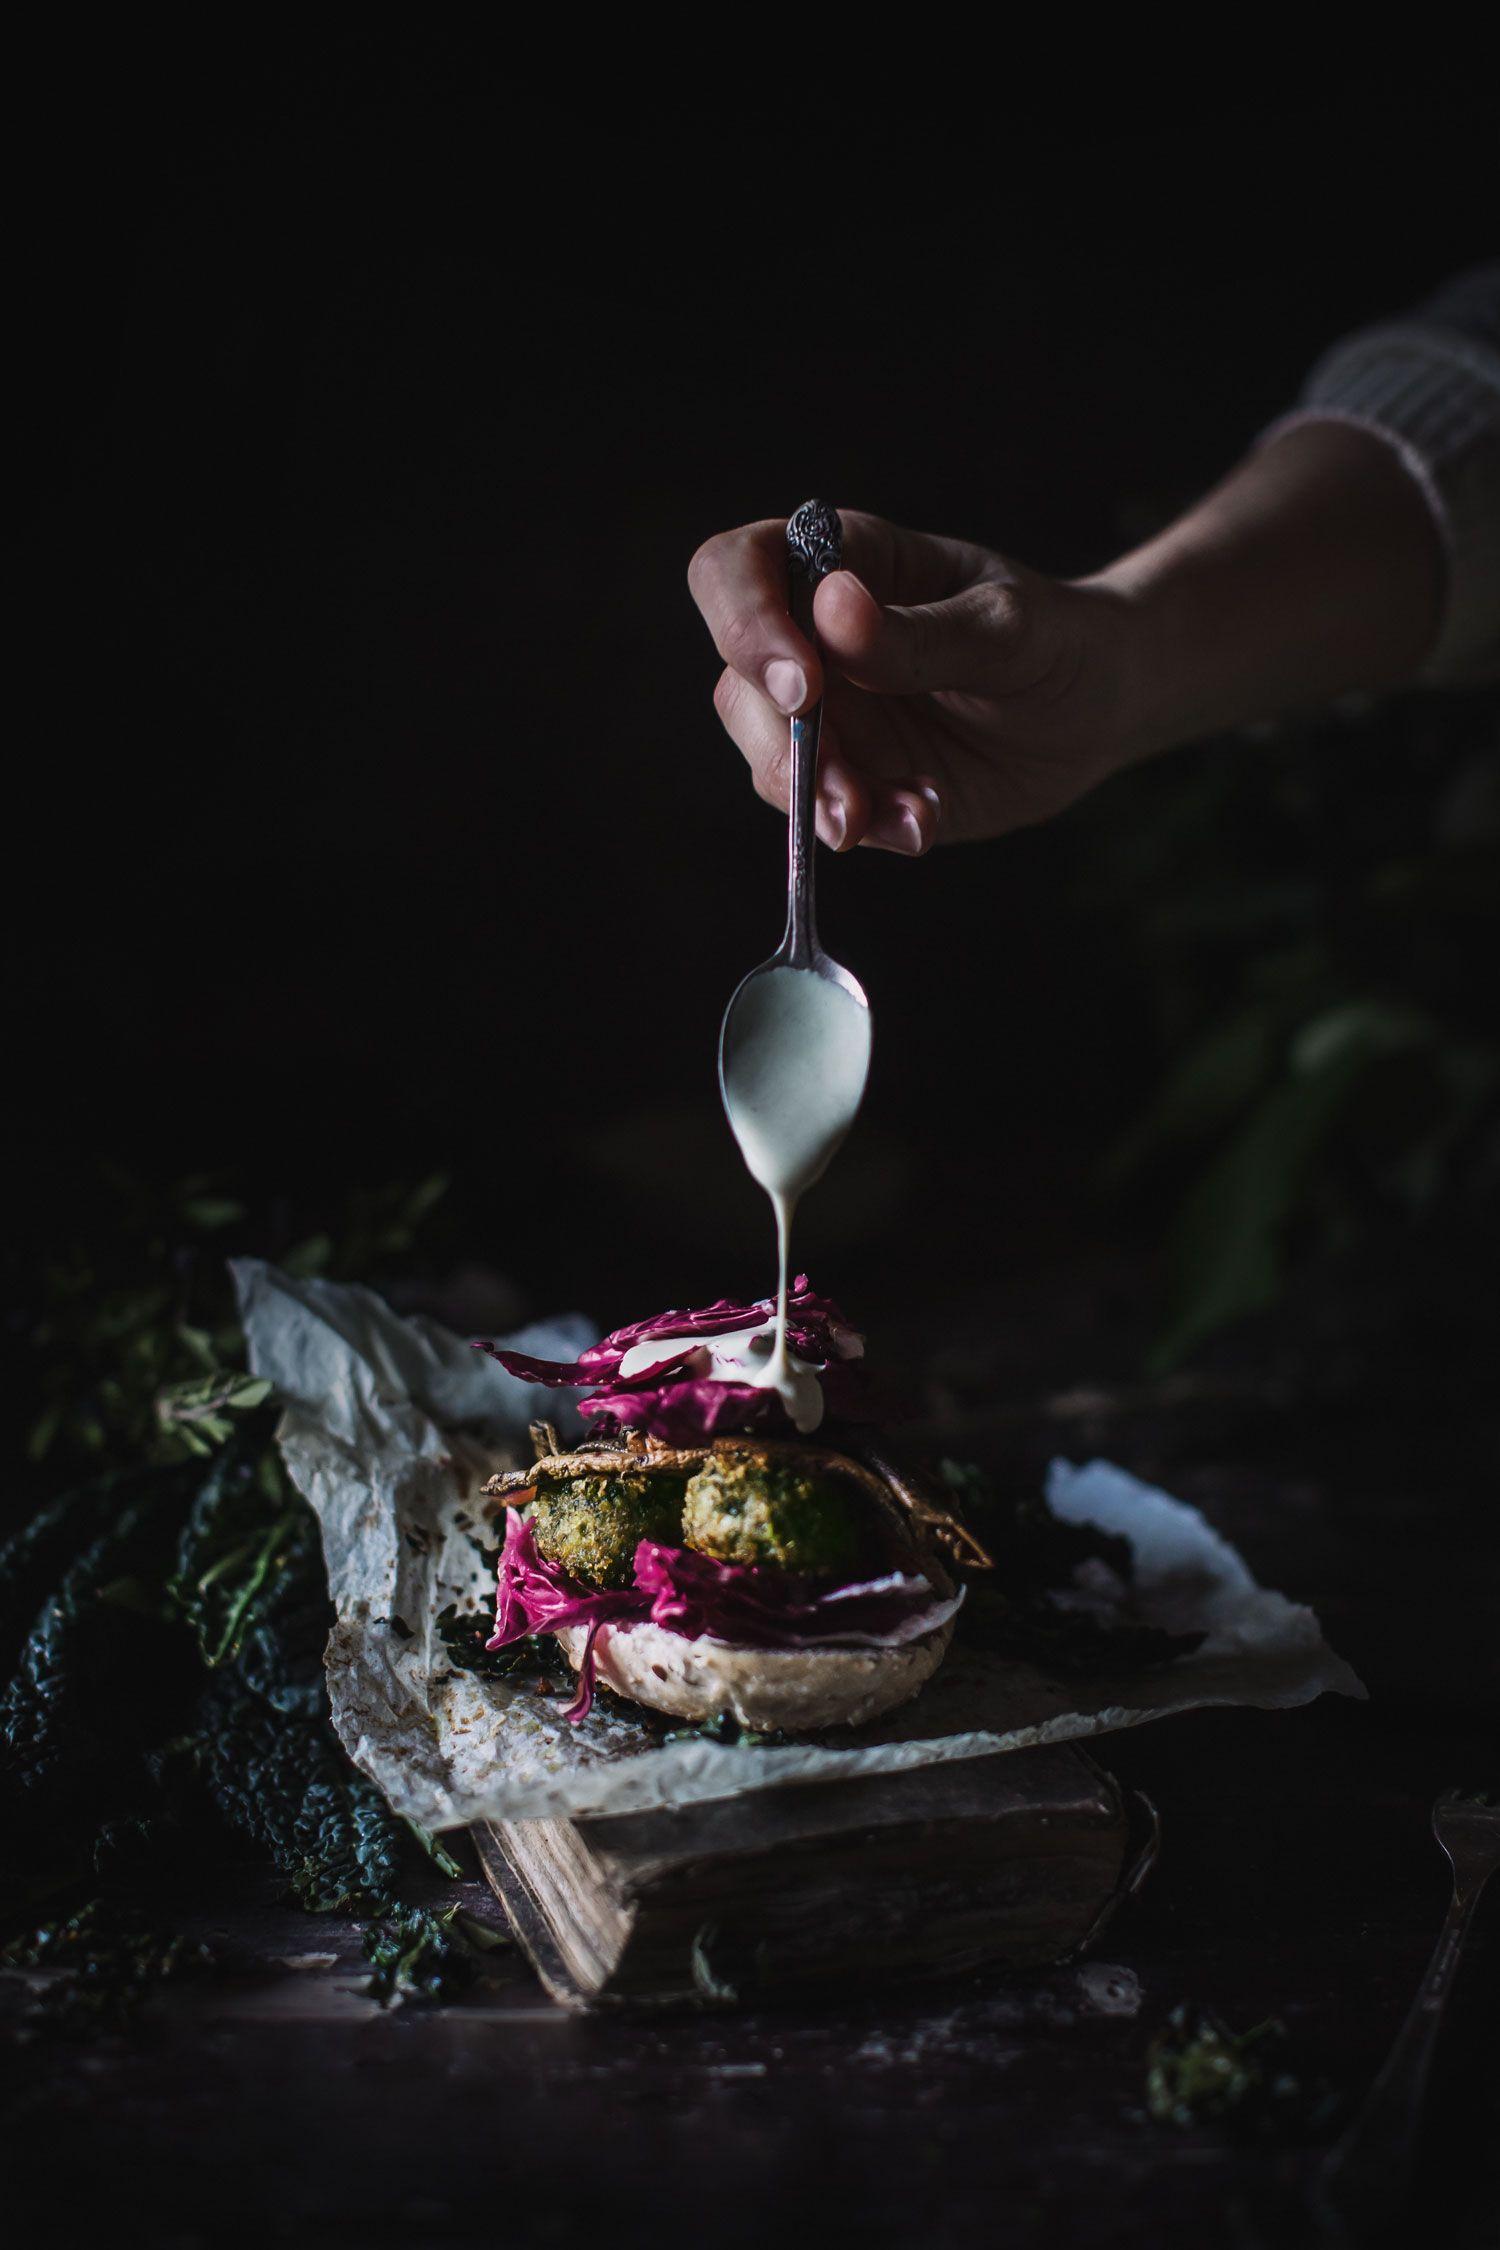 Vegetable Literacy #2 Veggie Kale Burger, & On Blog Writing